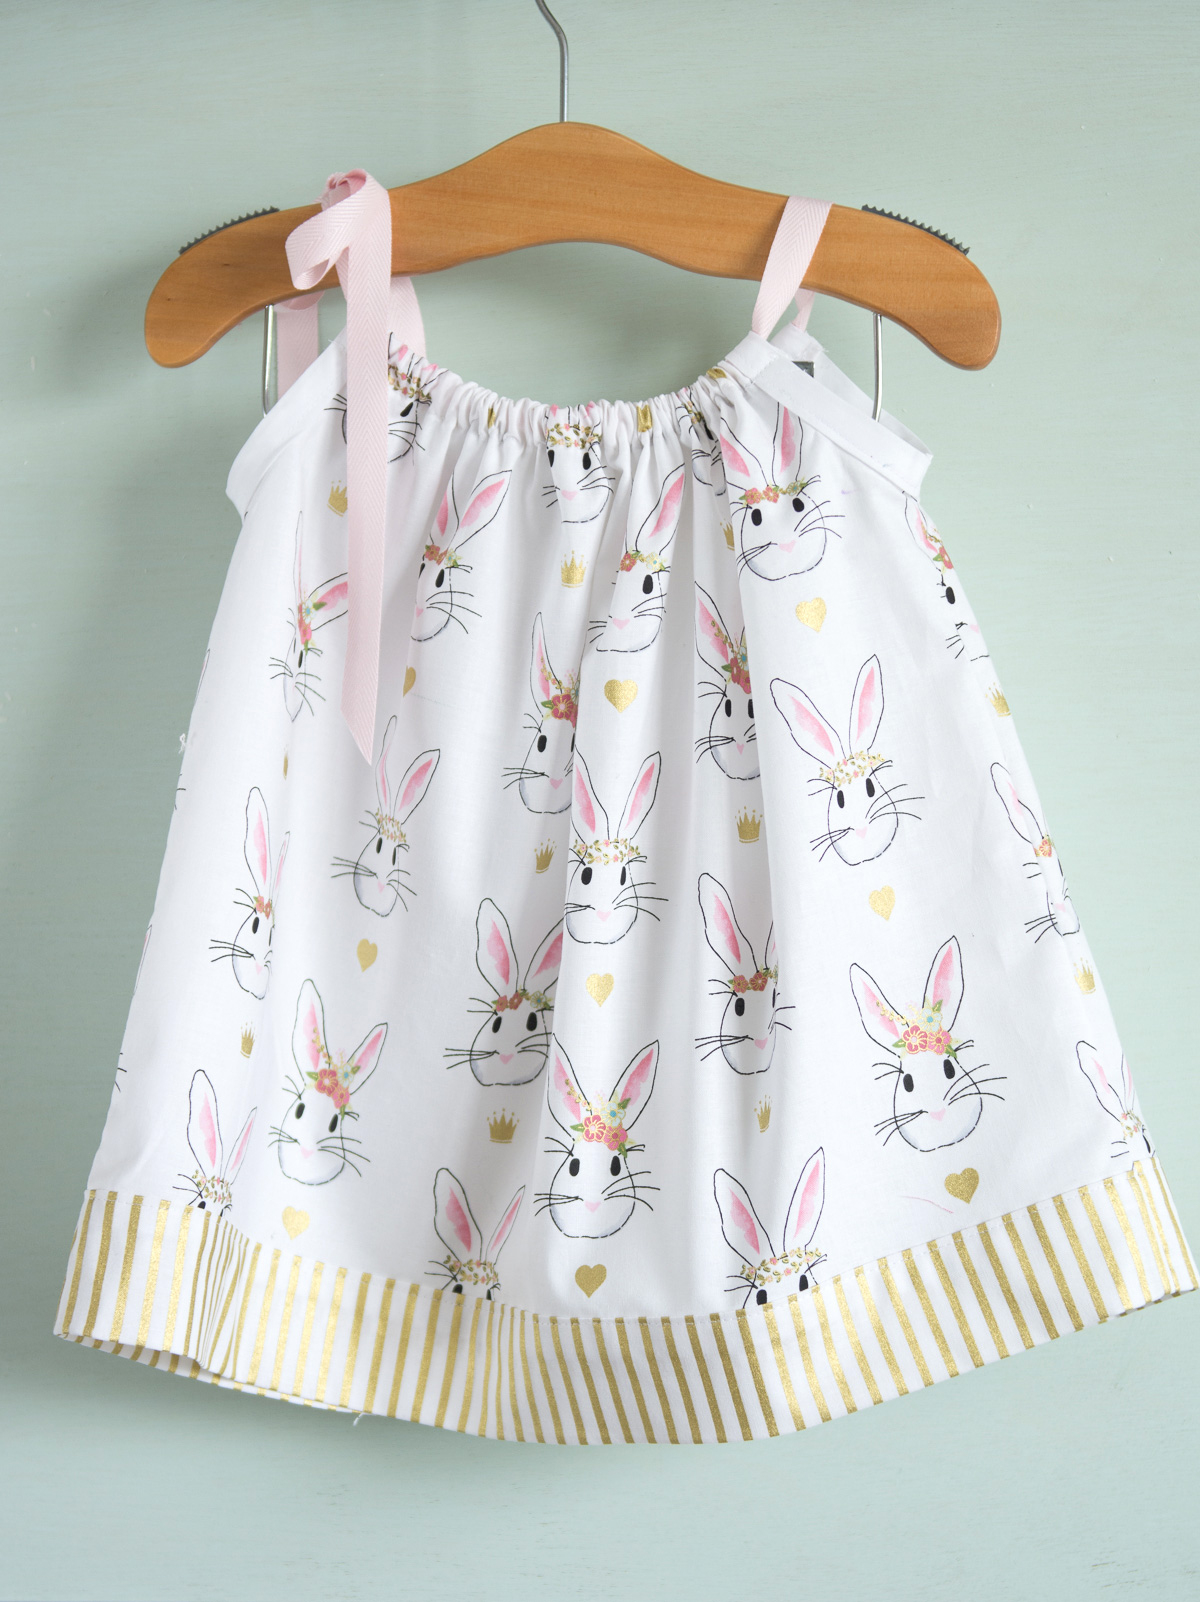 Pillowcase Dress Tutorial | Weallsew - Free Printable Pillowcase Dress Pattern